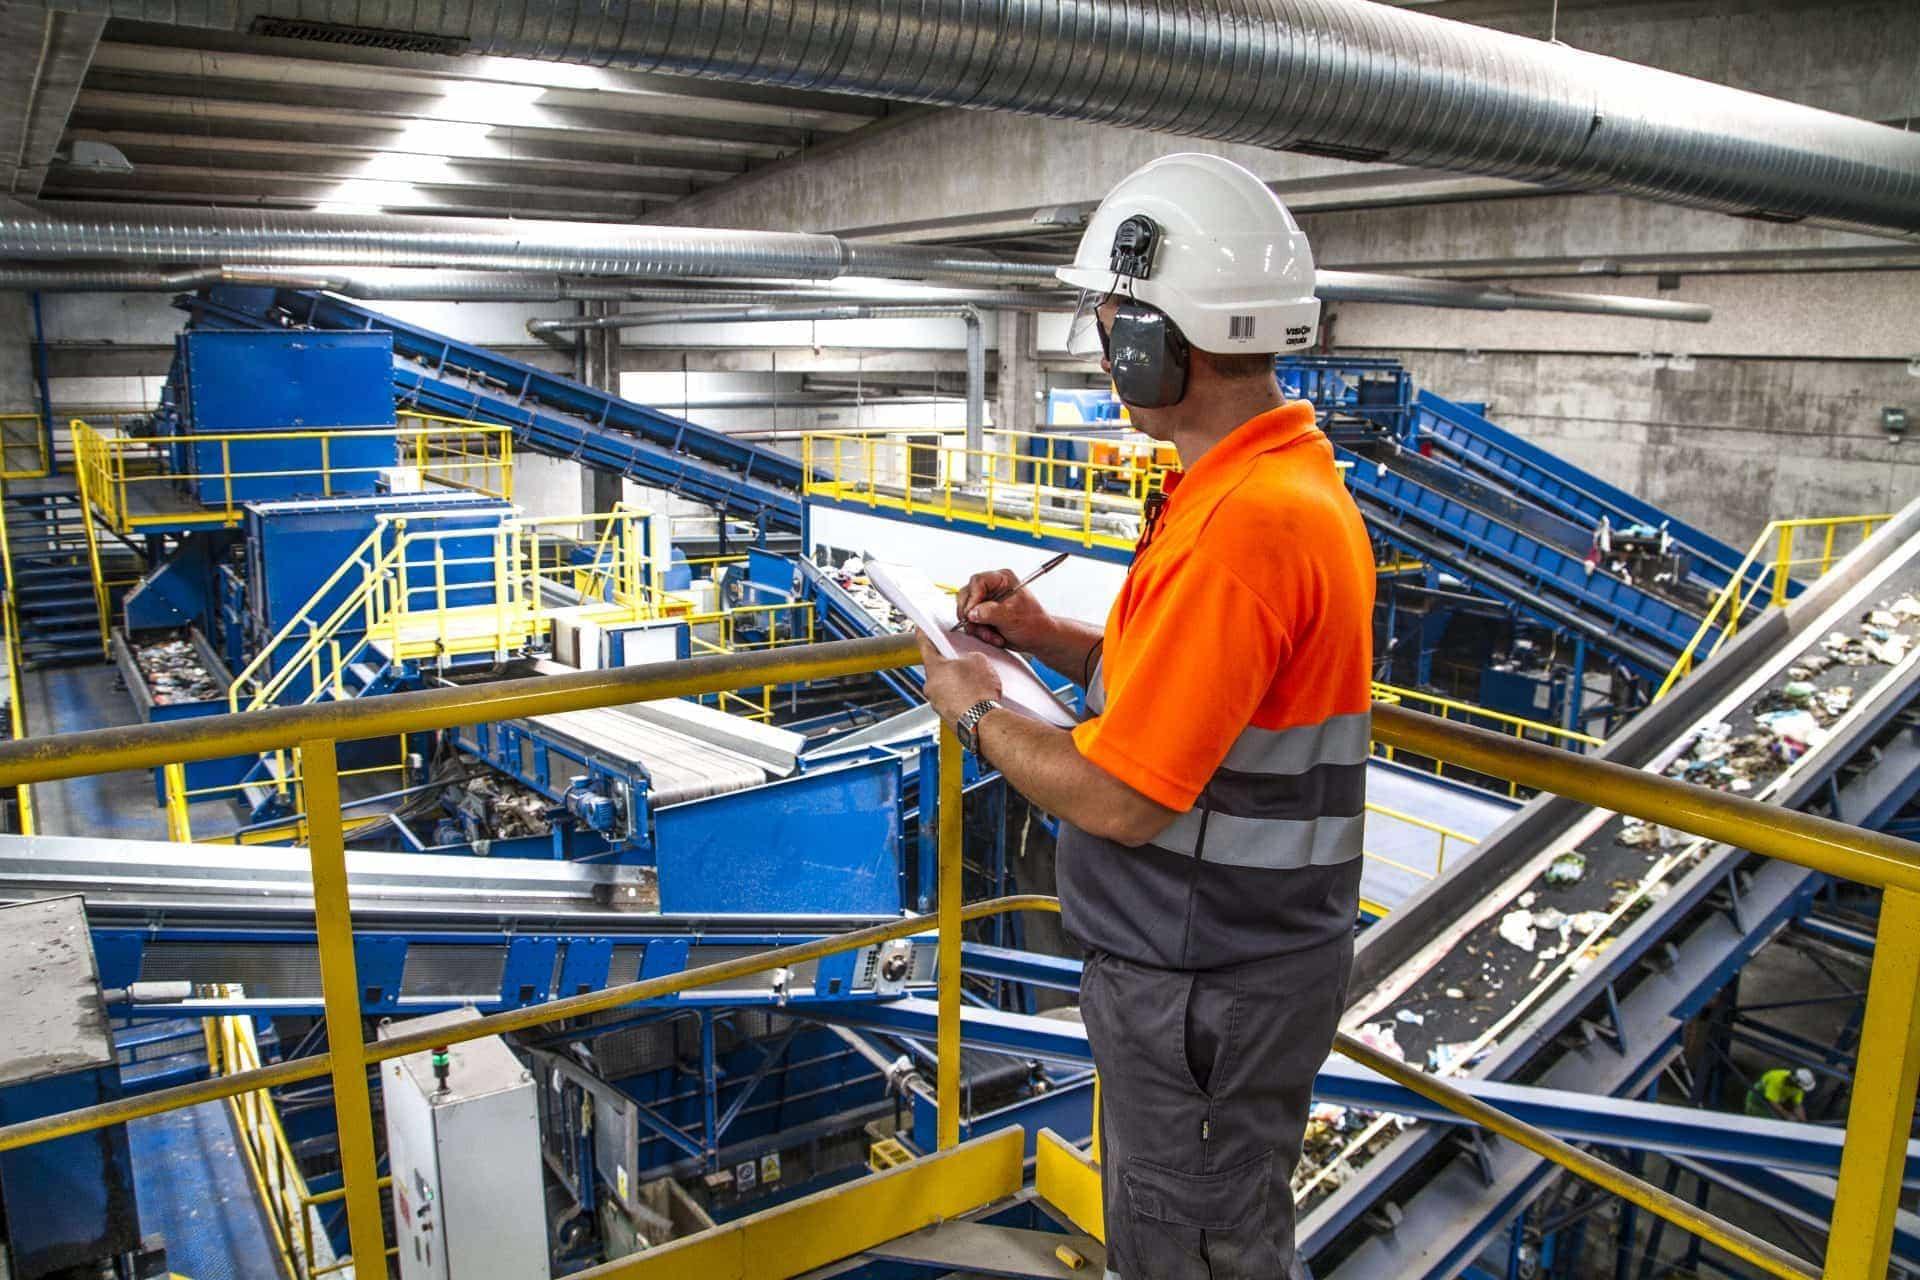 Waste Treatement Plant in Toledo